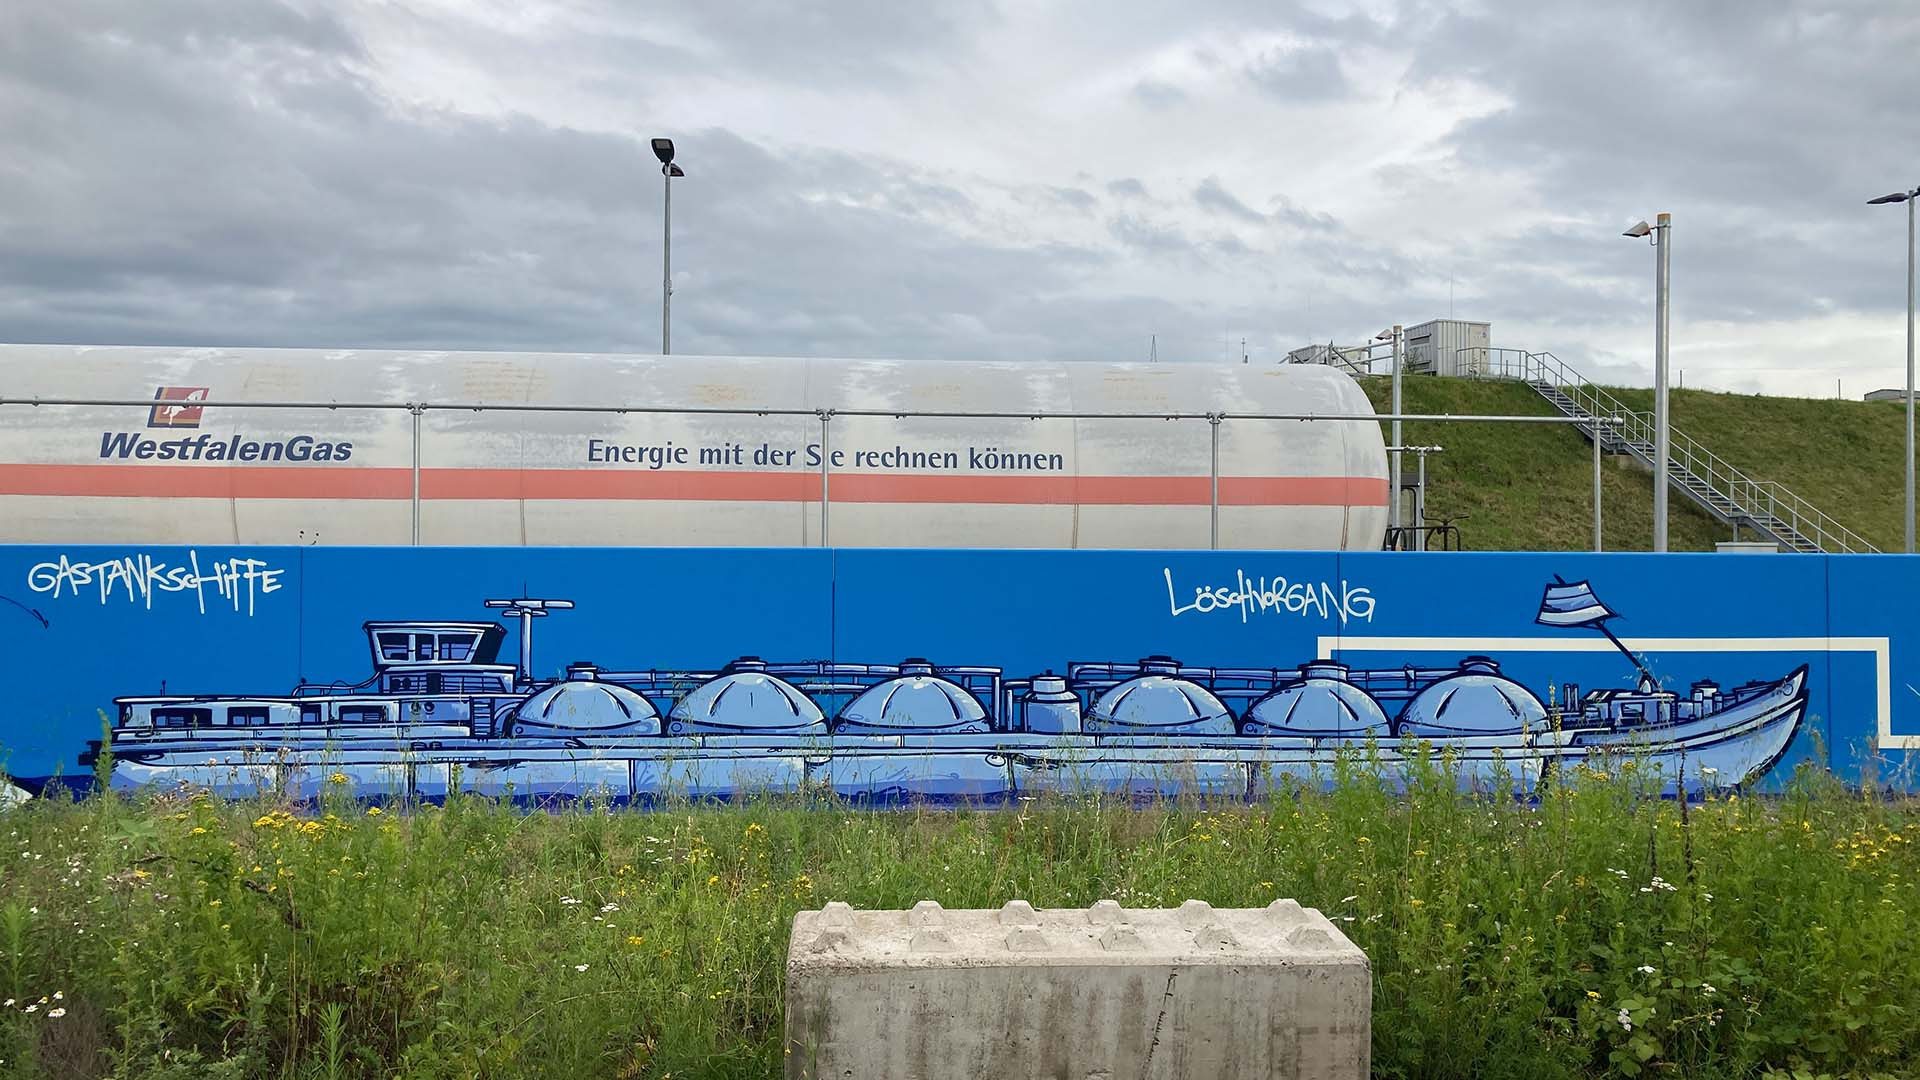 Schiff, Graffiti, Caratgas, Unternehmen, Firma, Krefeld, Gaswerk